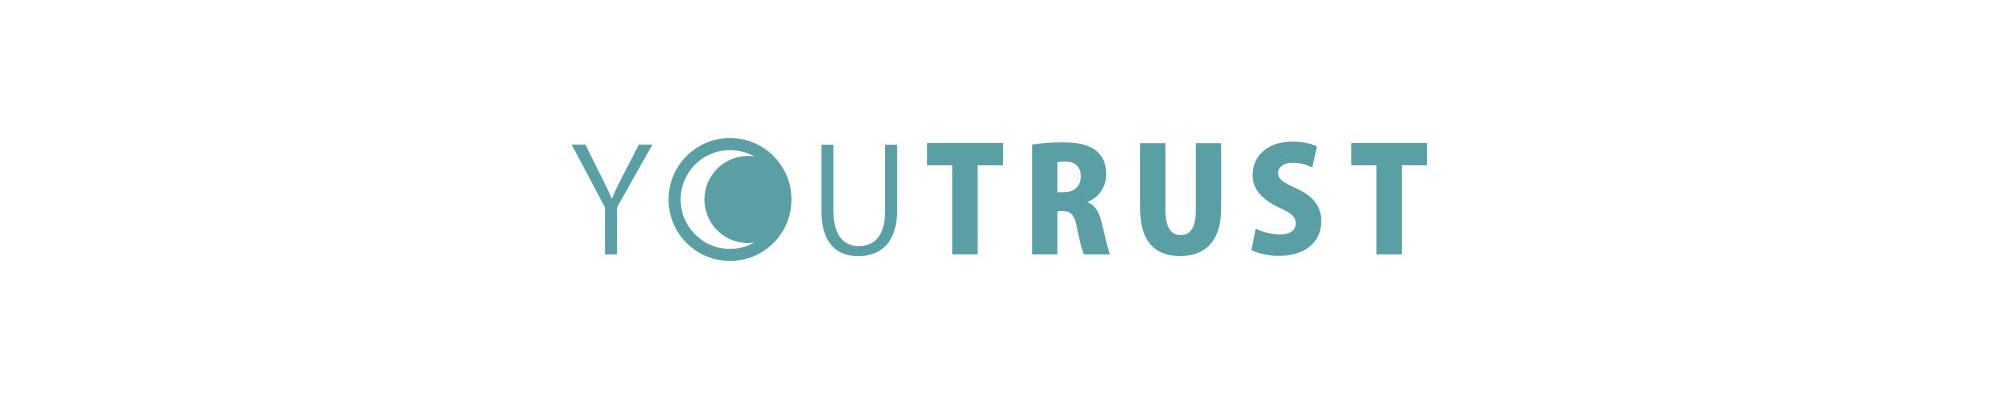 youtrust_logo_type4